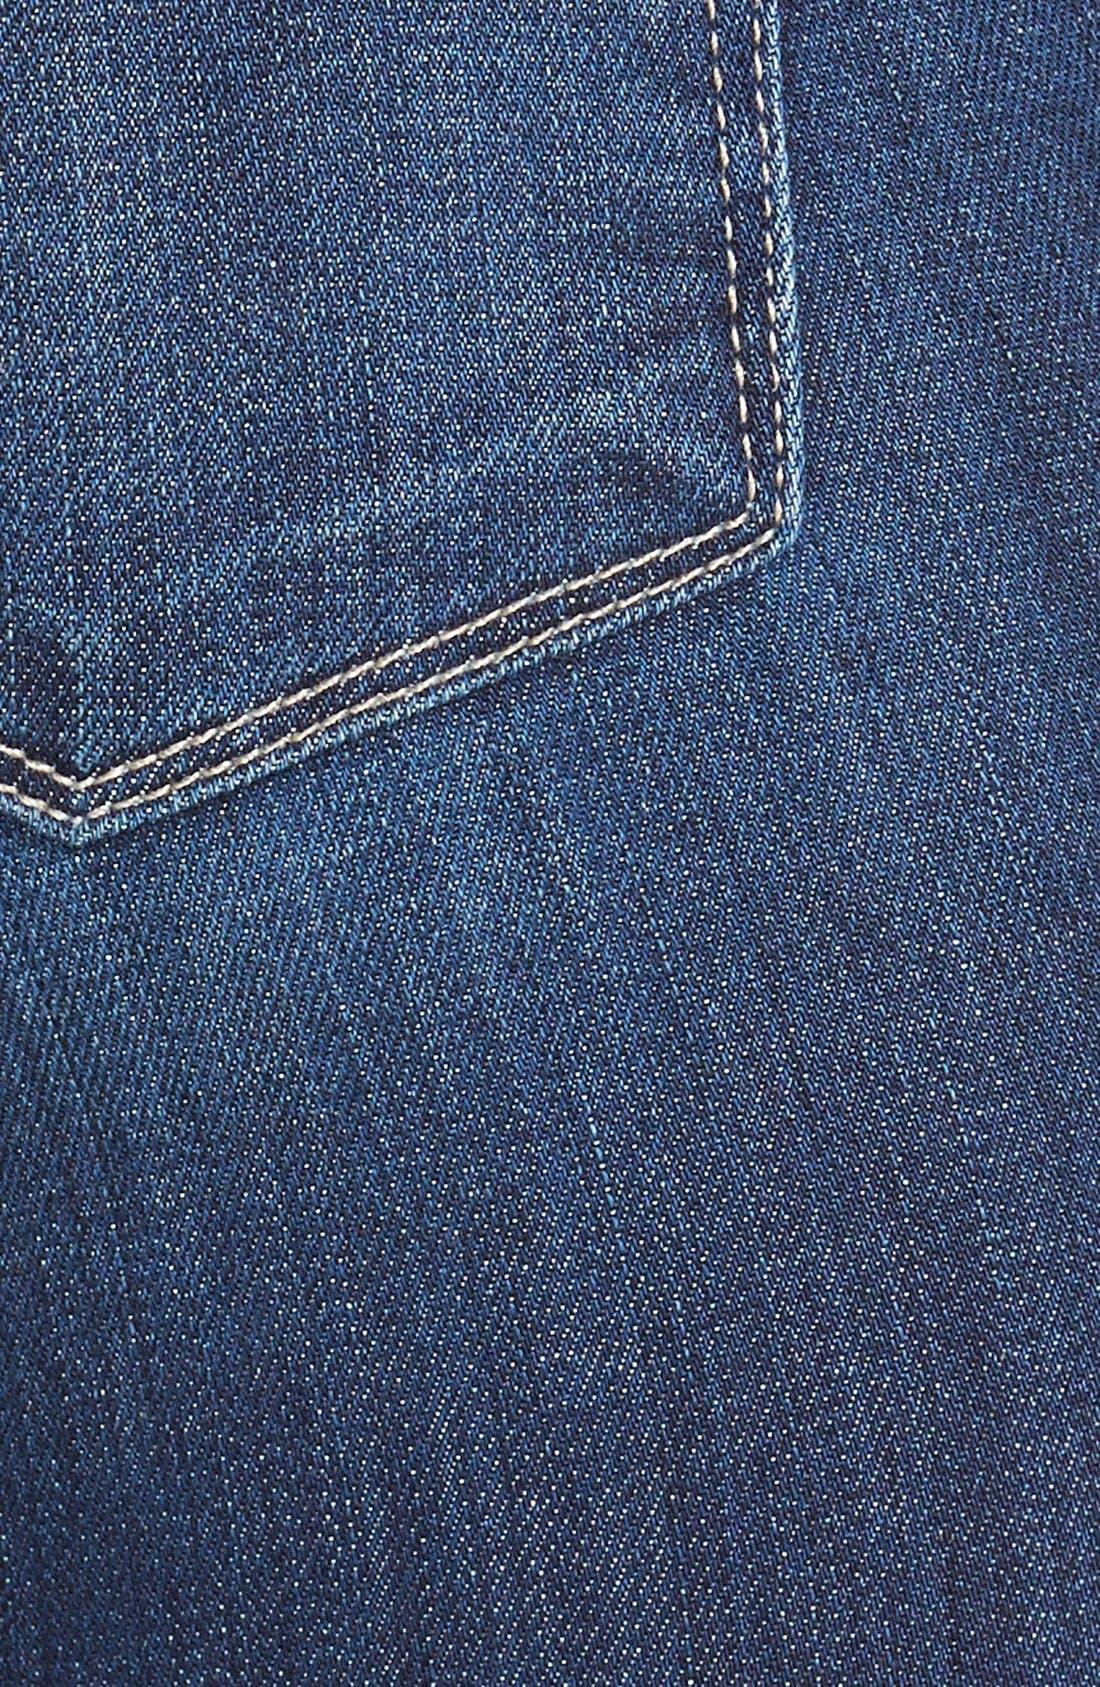 Alternate Image 4  - Paige Denim 'Skyline' Skinny Jeans (Raya) (Nordstrom Exclusive)